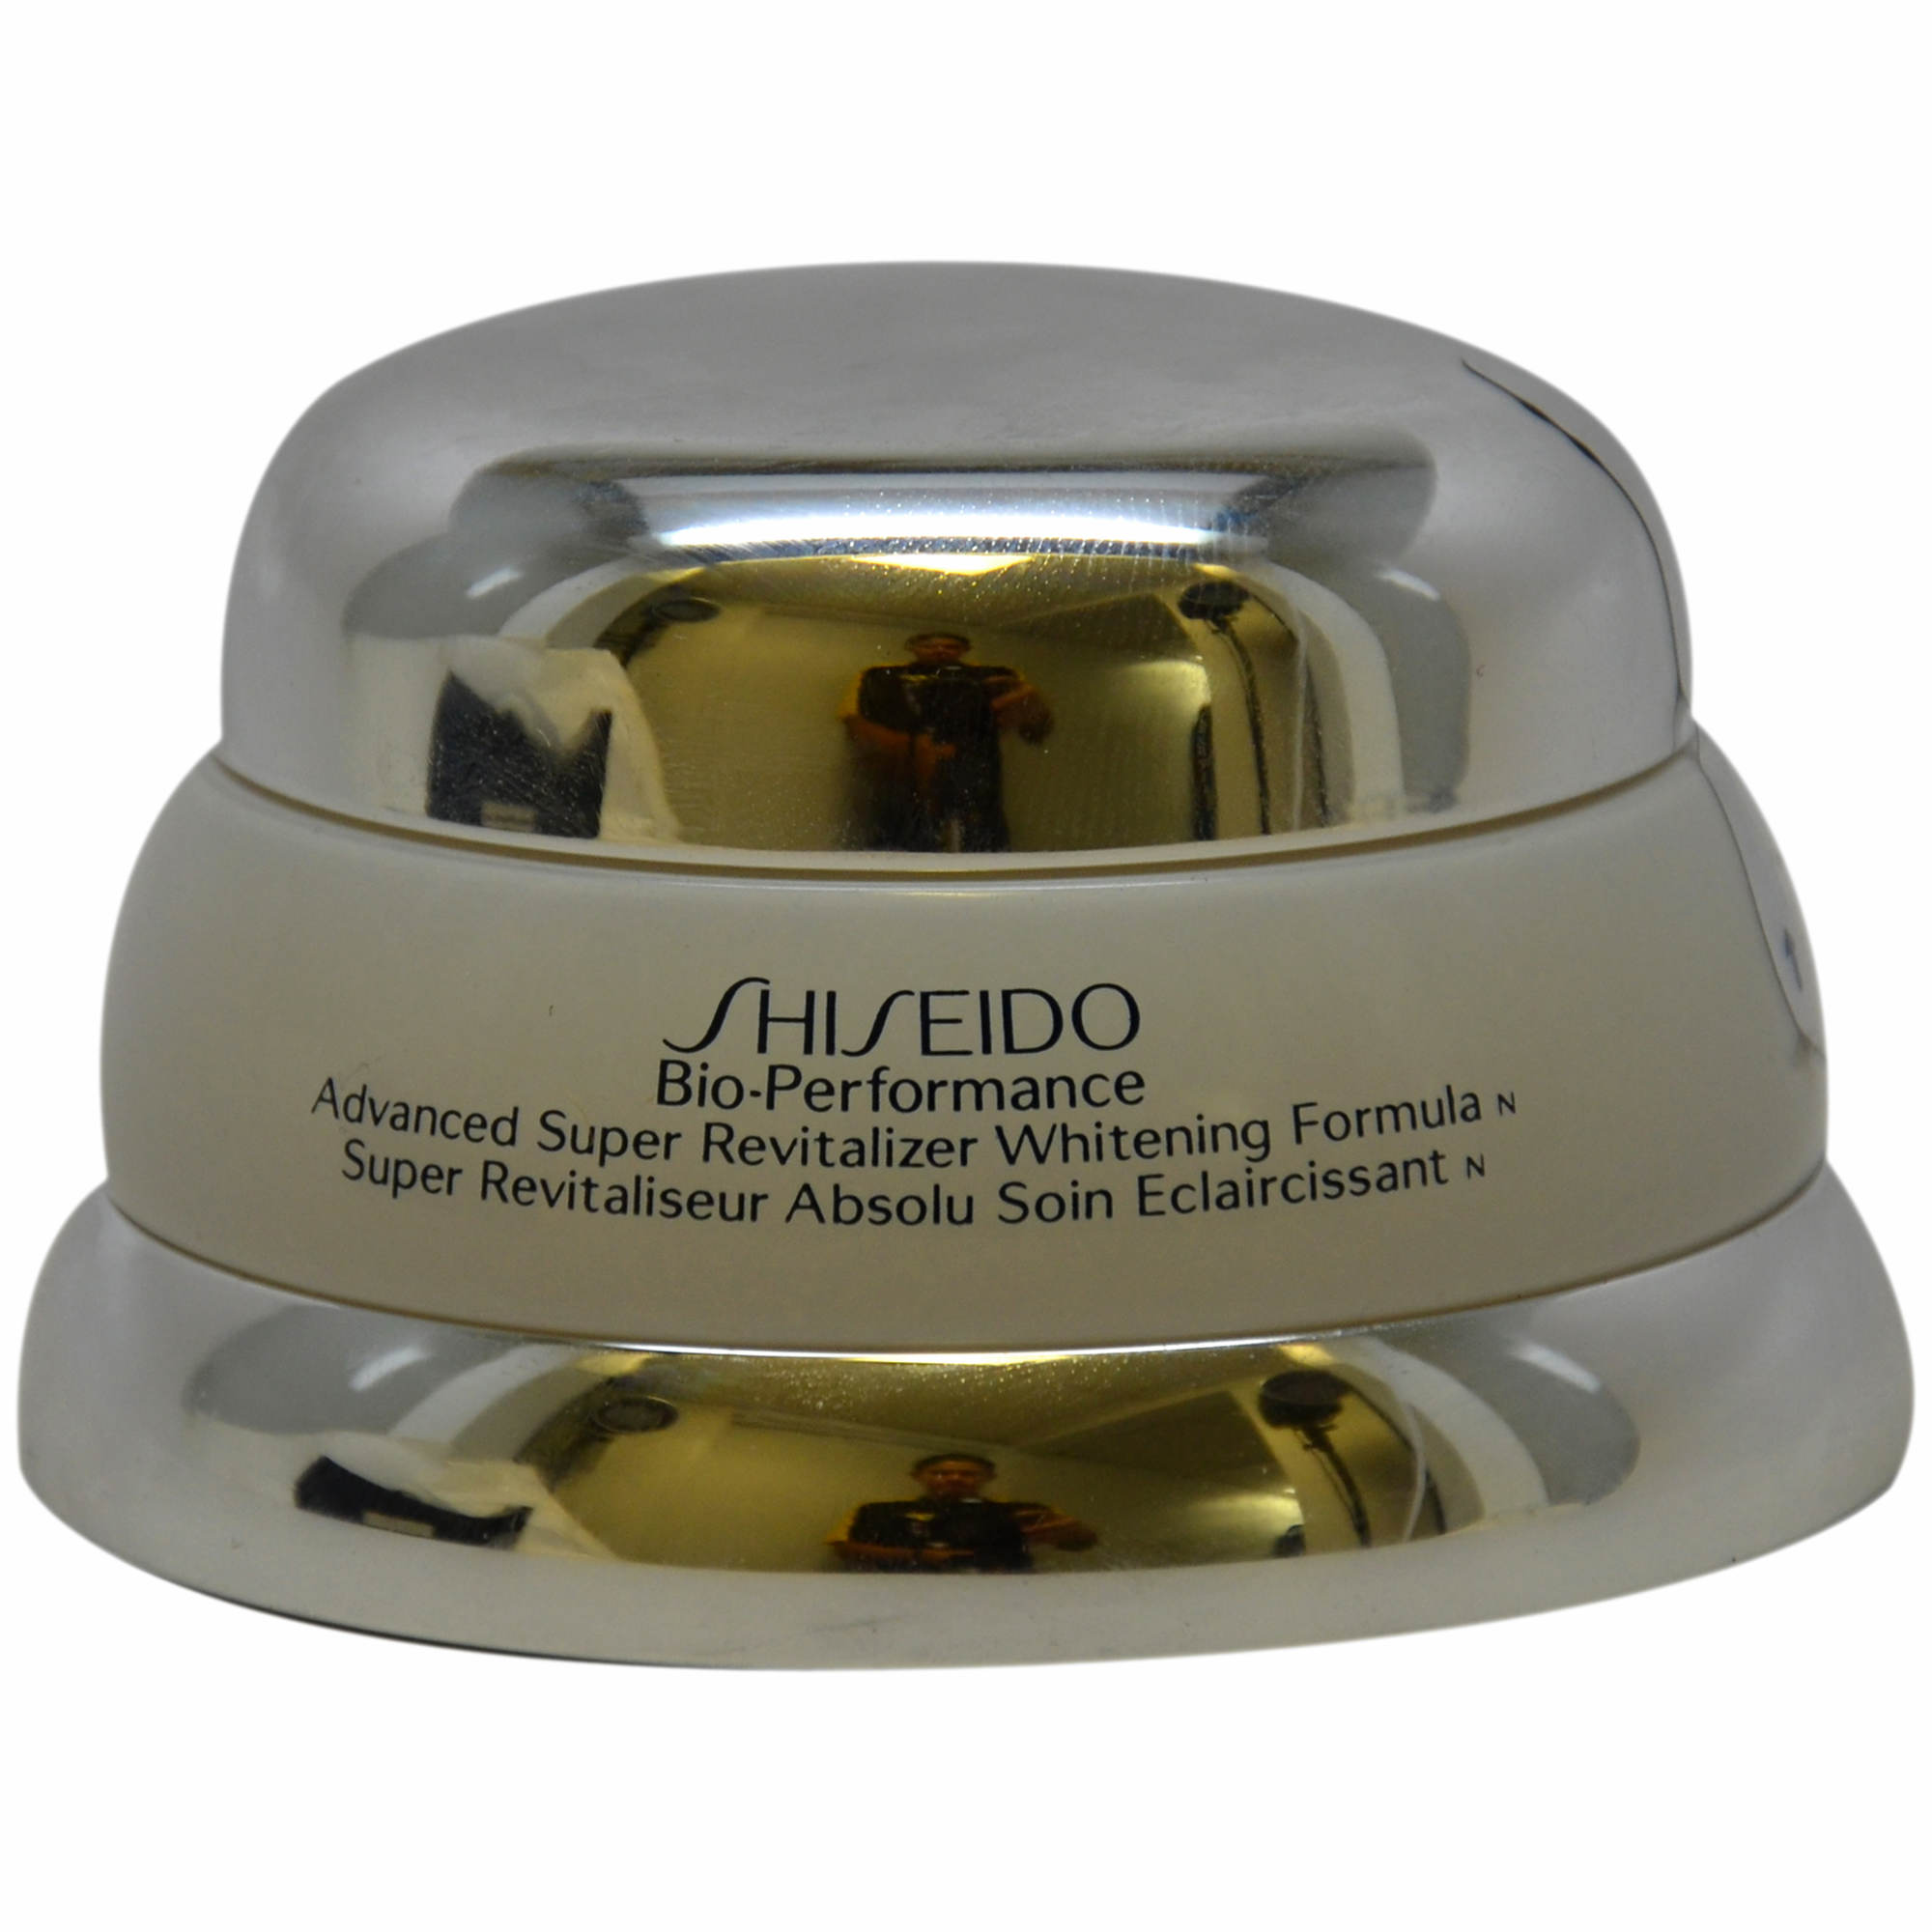 shiseido bio performance advanced super revitalizer. Black Bedroom Furniture Sets. Home Design Ideas